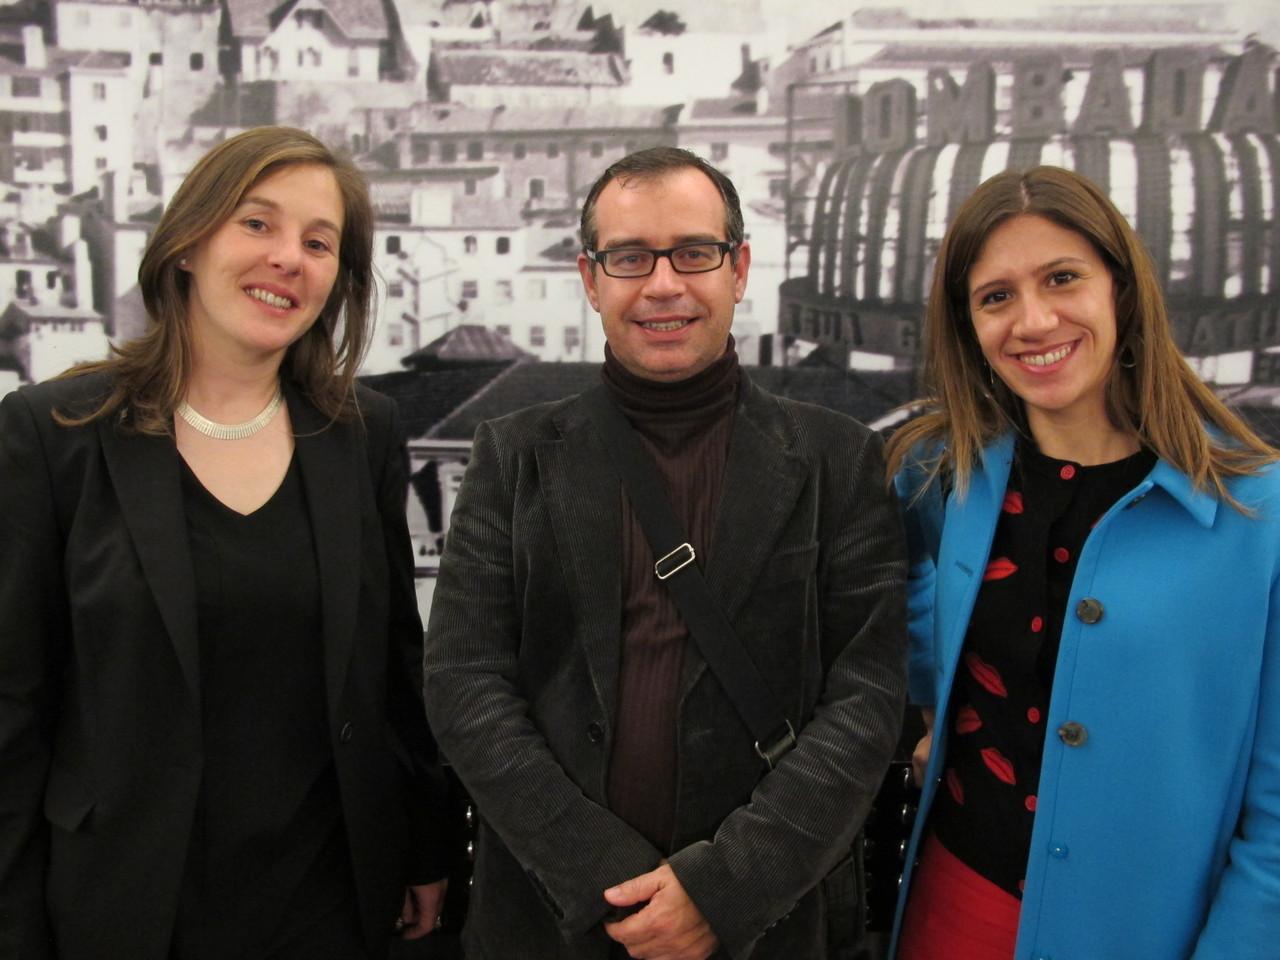 Maria Manuel, Manuel Moreira, Rita Nabeiro .JPG